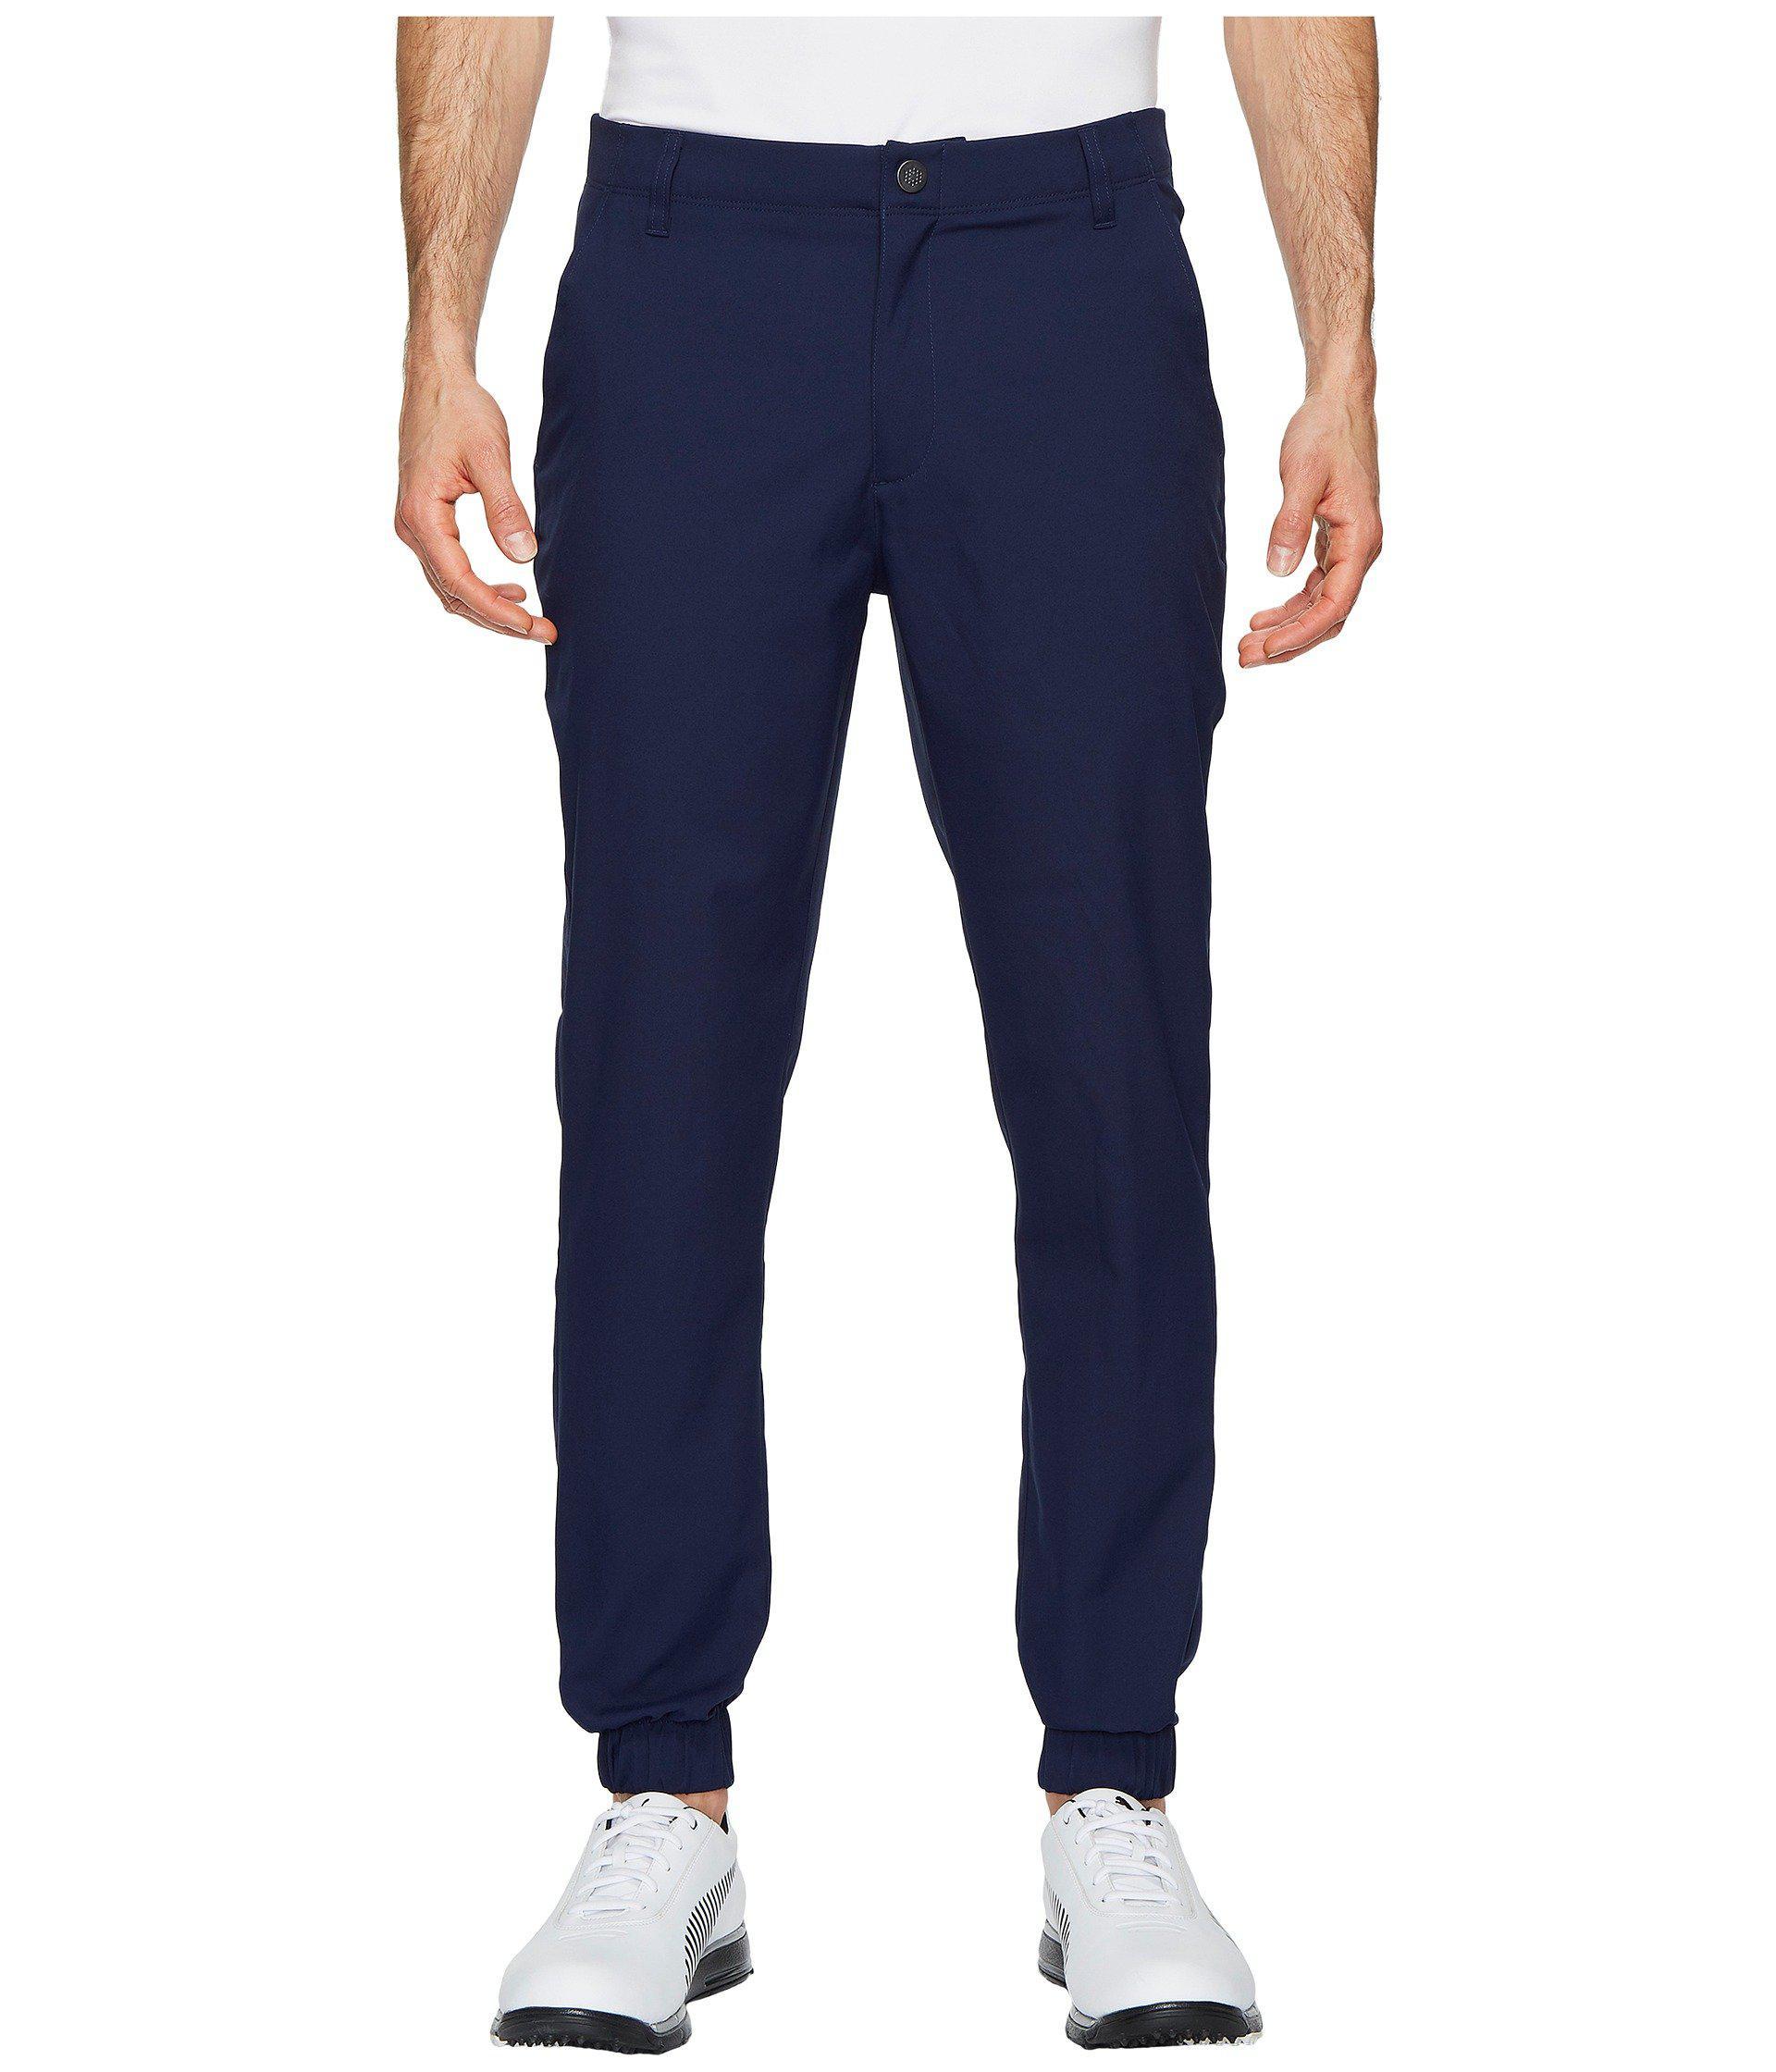 39af495f53c3 Lyst - PUMA Golf Joggers (quarry) Men s Casual Pants in Blue for Men